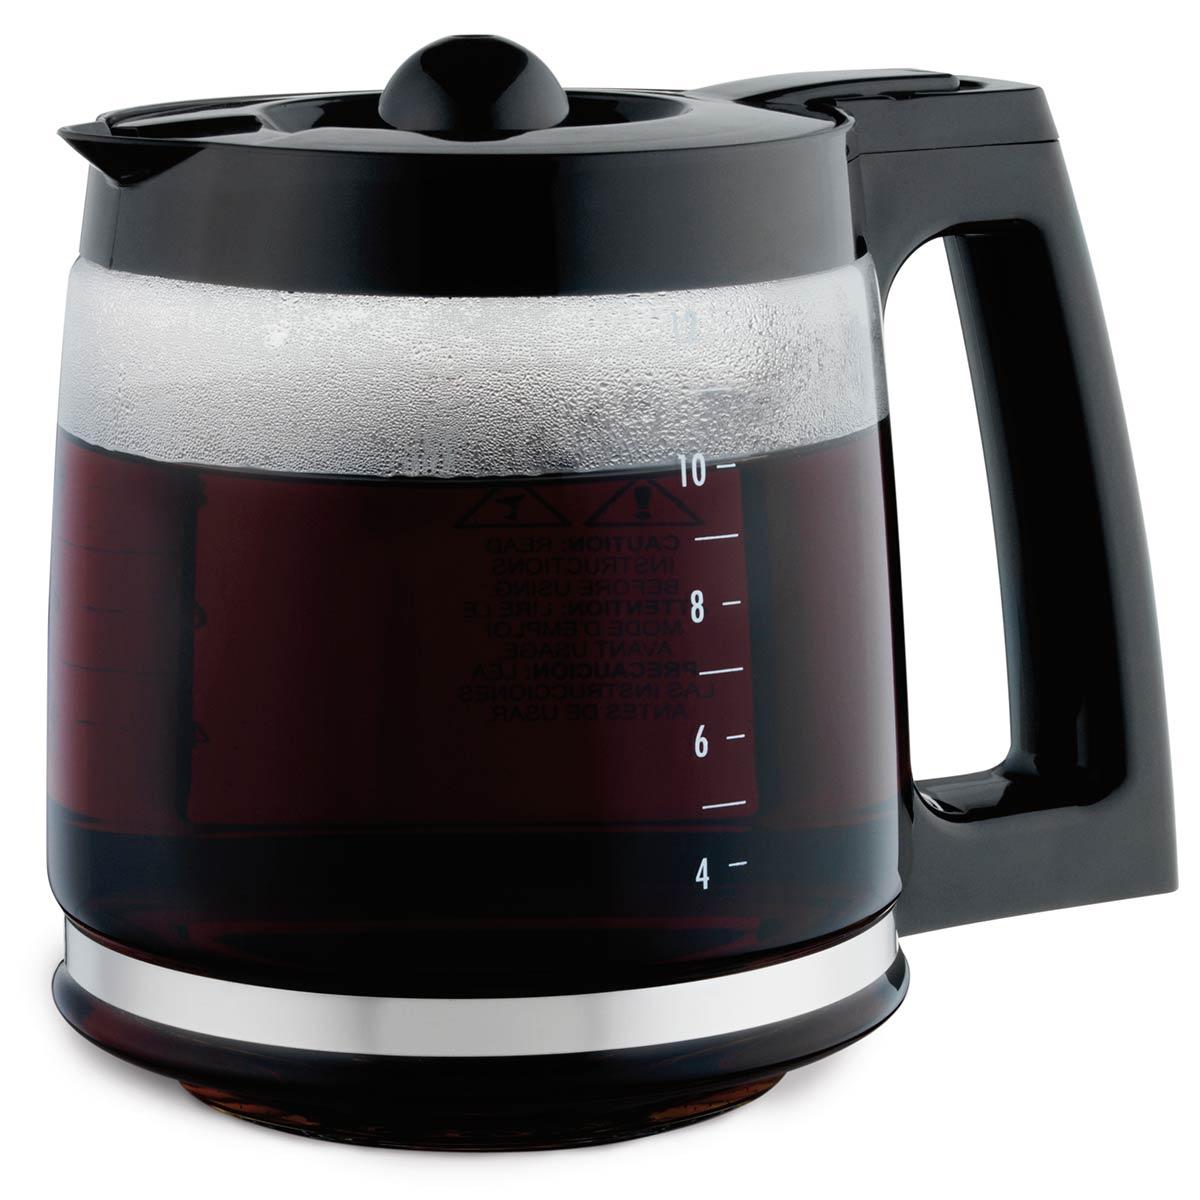 Hamilton Beach Coffee Maker Replacement Carafe Black 990117800